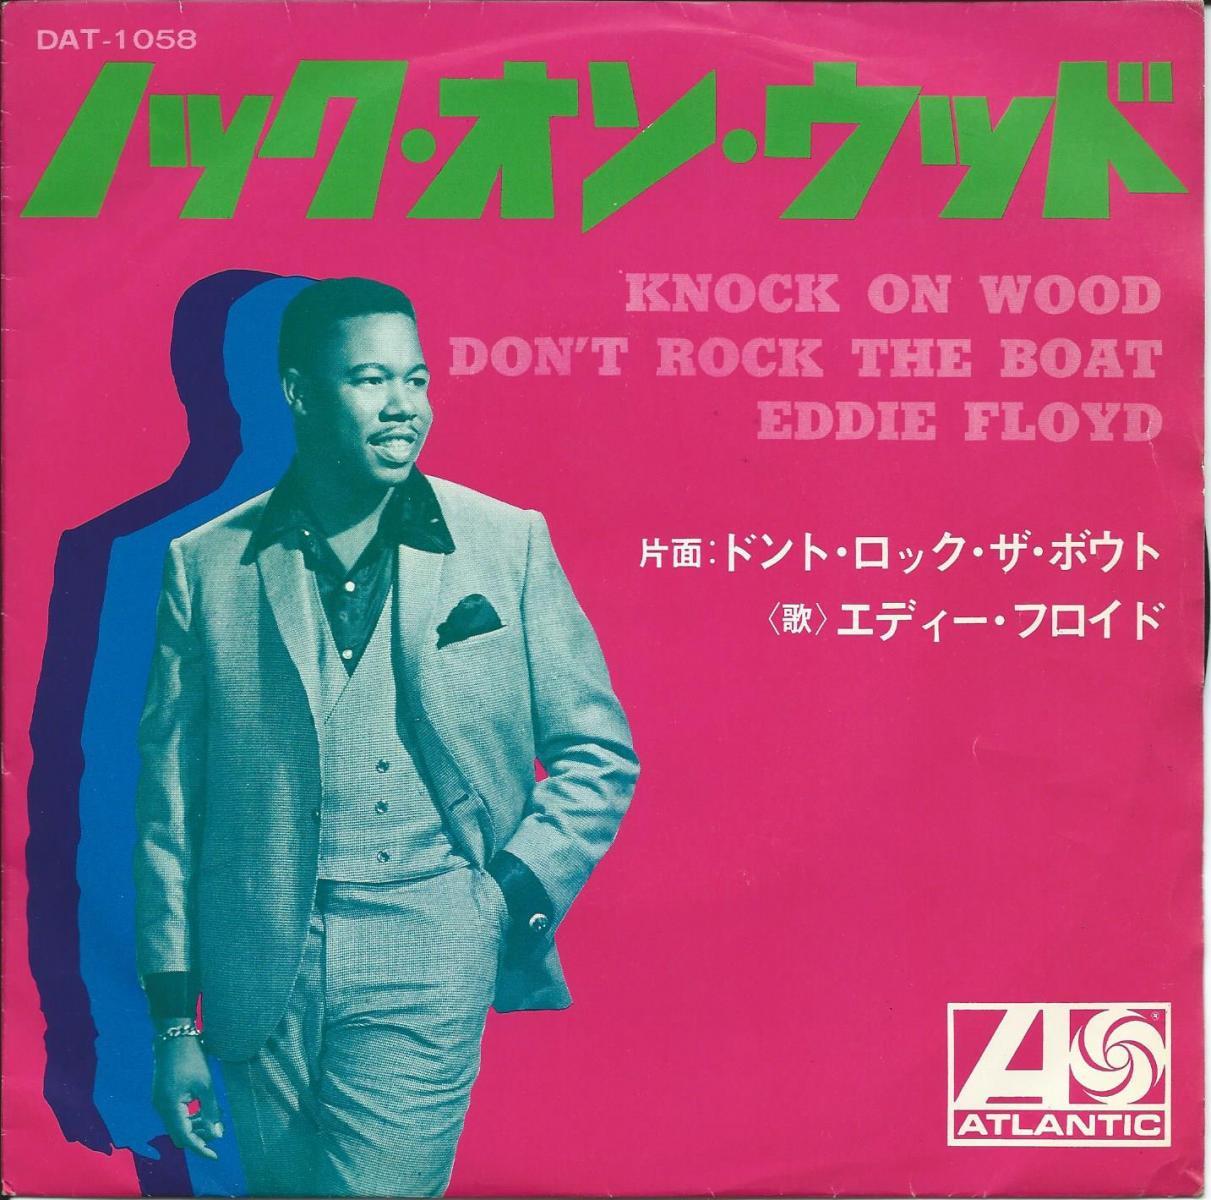 EDDIE FLOYD エディー・フロイド / KNOCK ON WOOD ノック・オン・ウッド (7